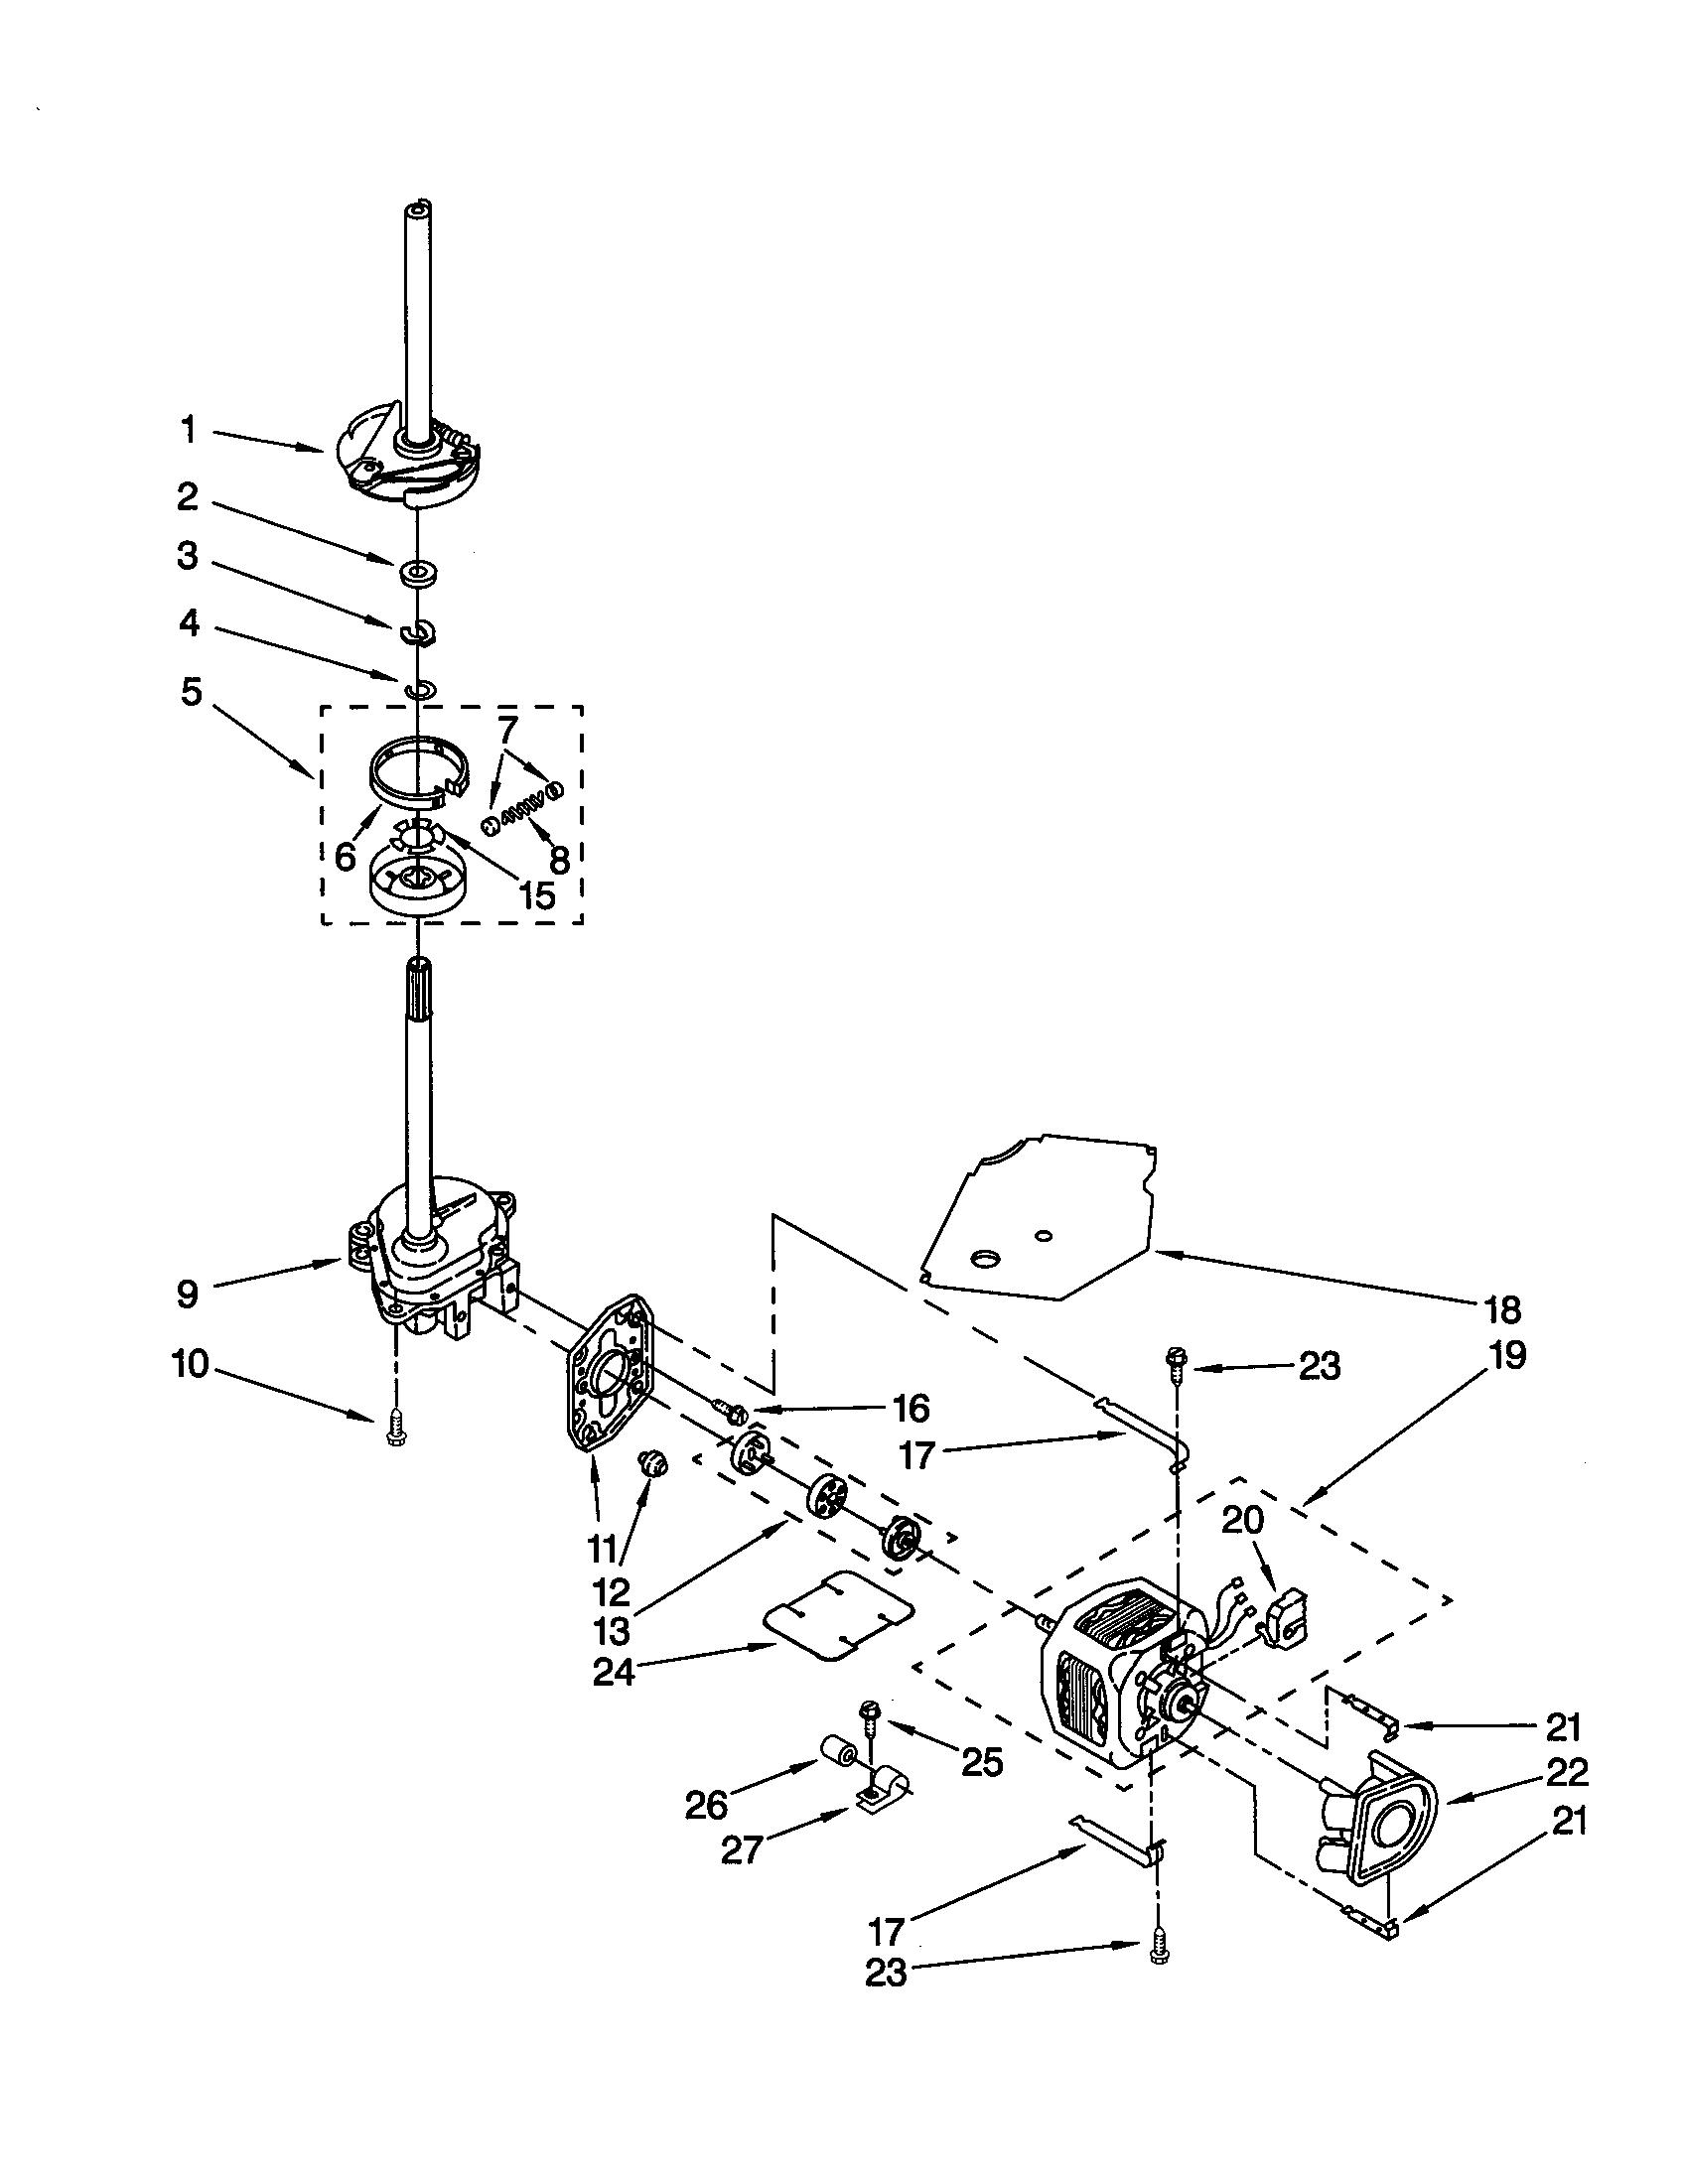 Whirlpool Lsq Jq0 Washer Clutch Assembly